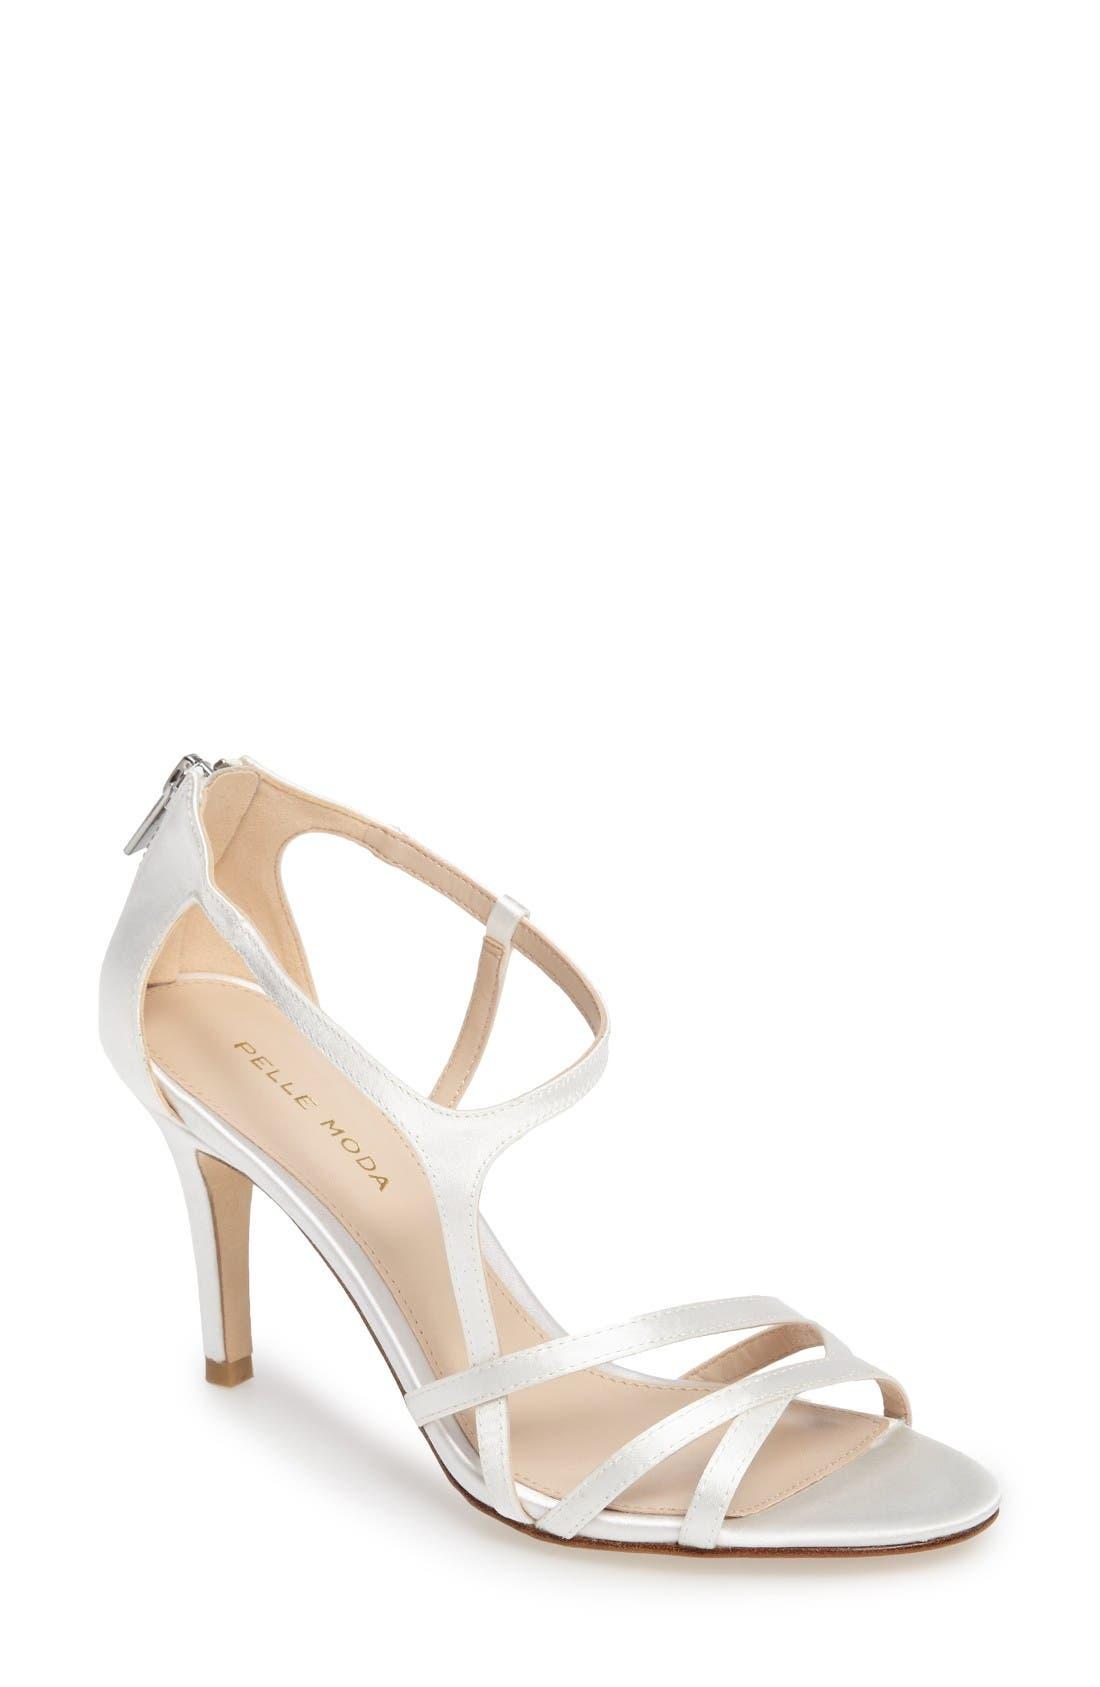 PELLE MODA Ruby Asymmetrical Strappy Sandal